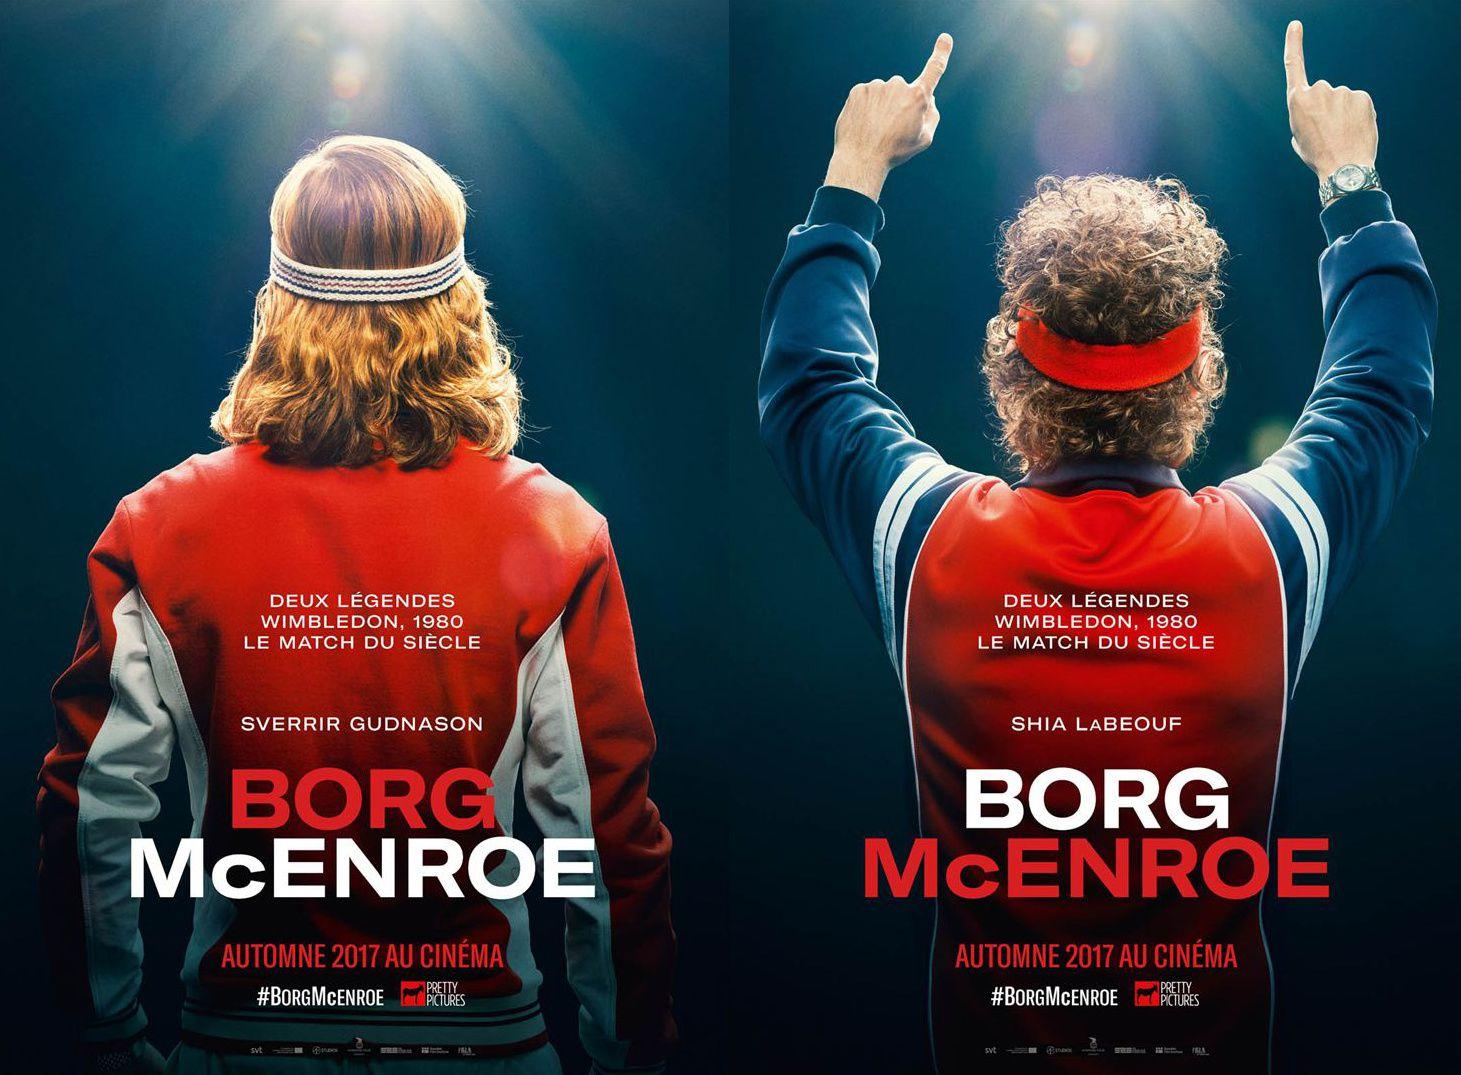 Borg/McEnroe (BANDE ANNONCE) avec Shia LaBeouf, Sverrir Gudnason - Le 8 nov. au cinéma